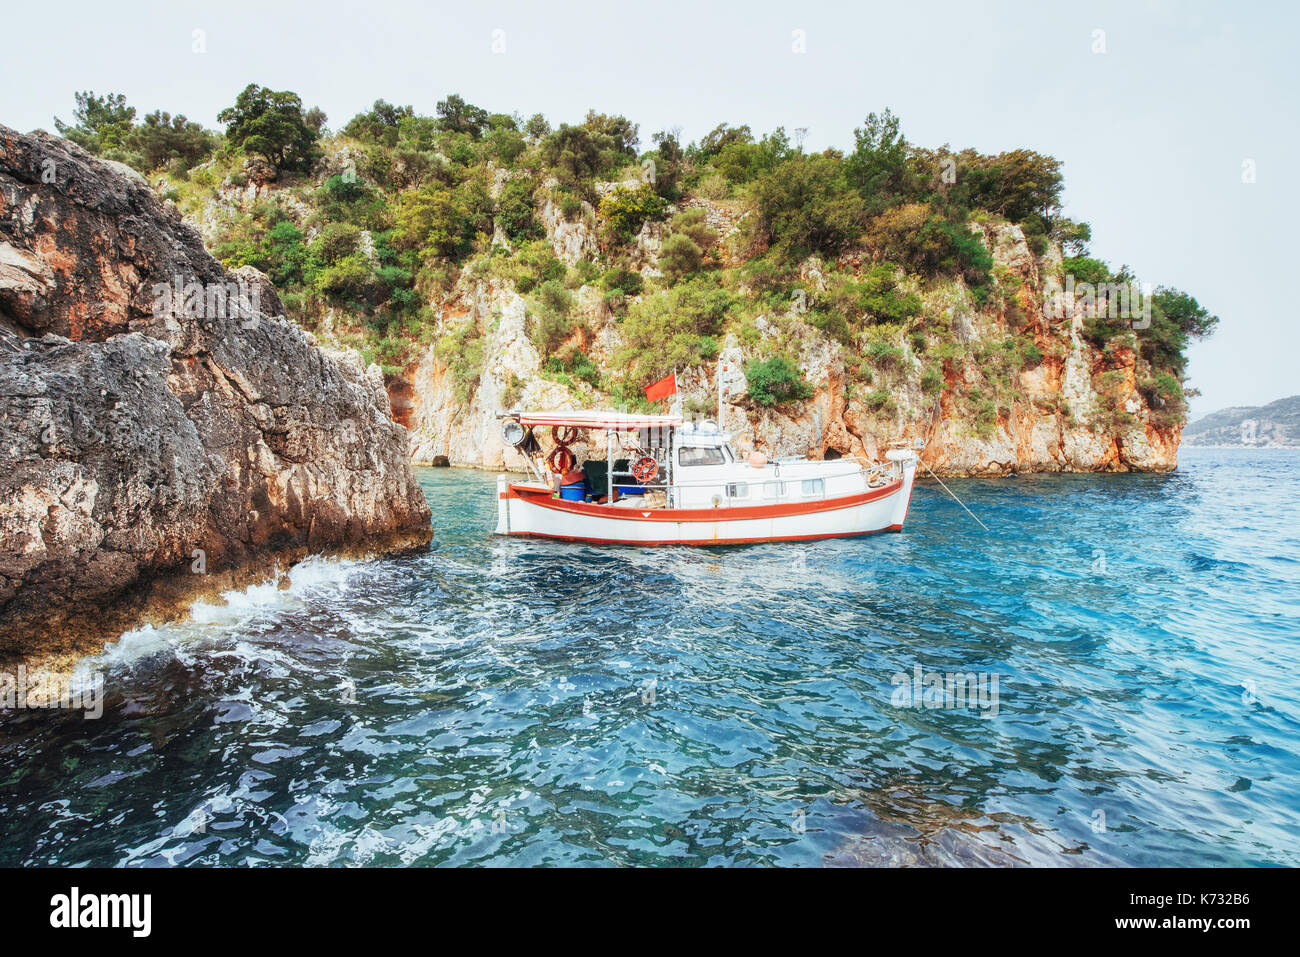 Panoramablick auf die Küste. Beauty Welt. Türkei Stockbild